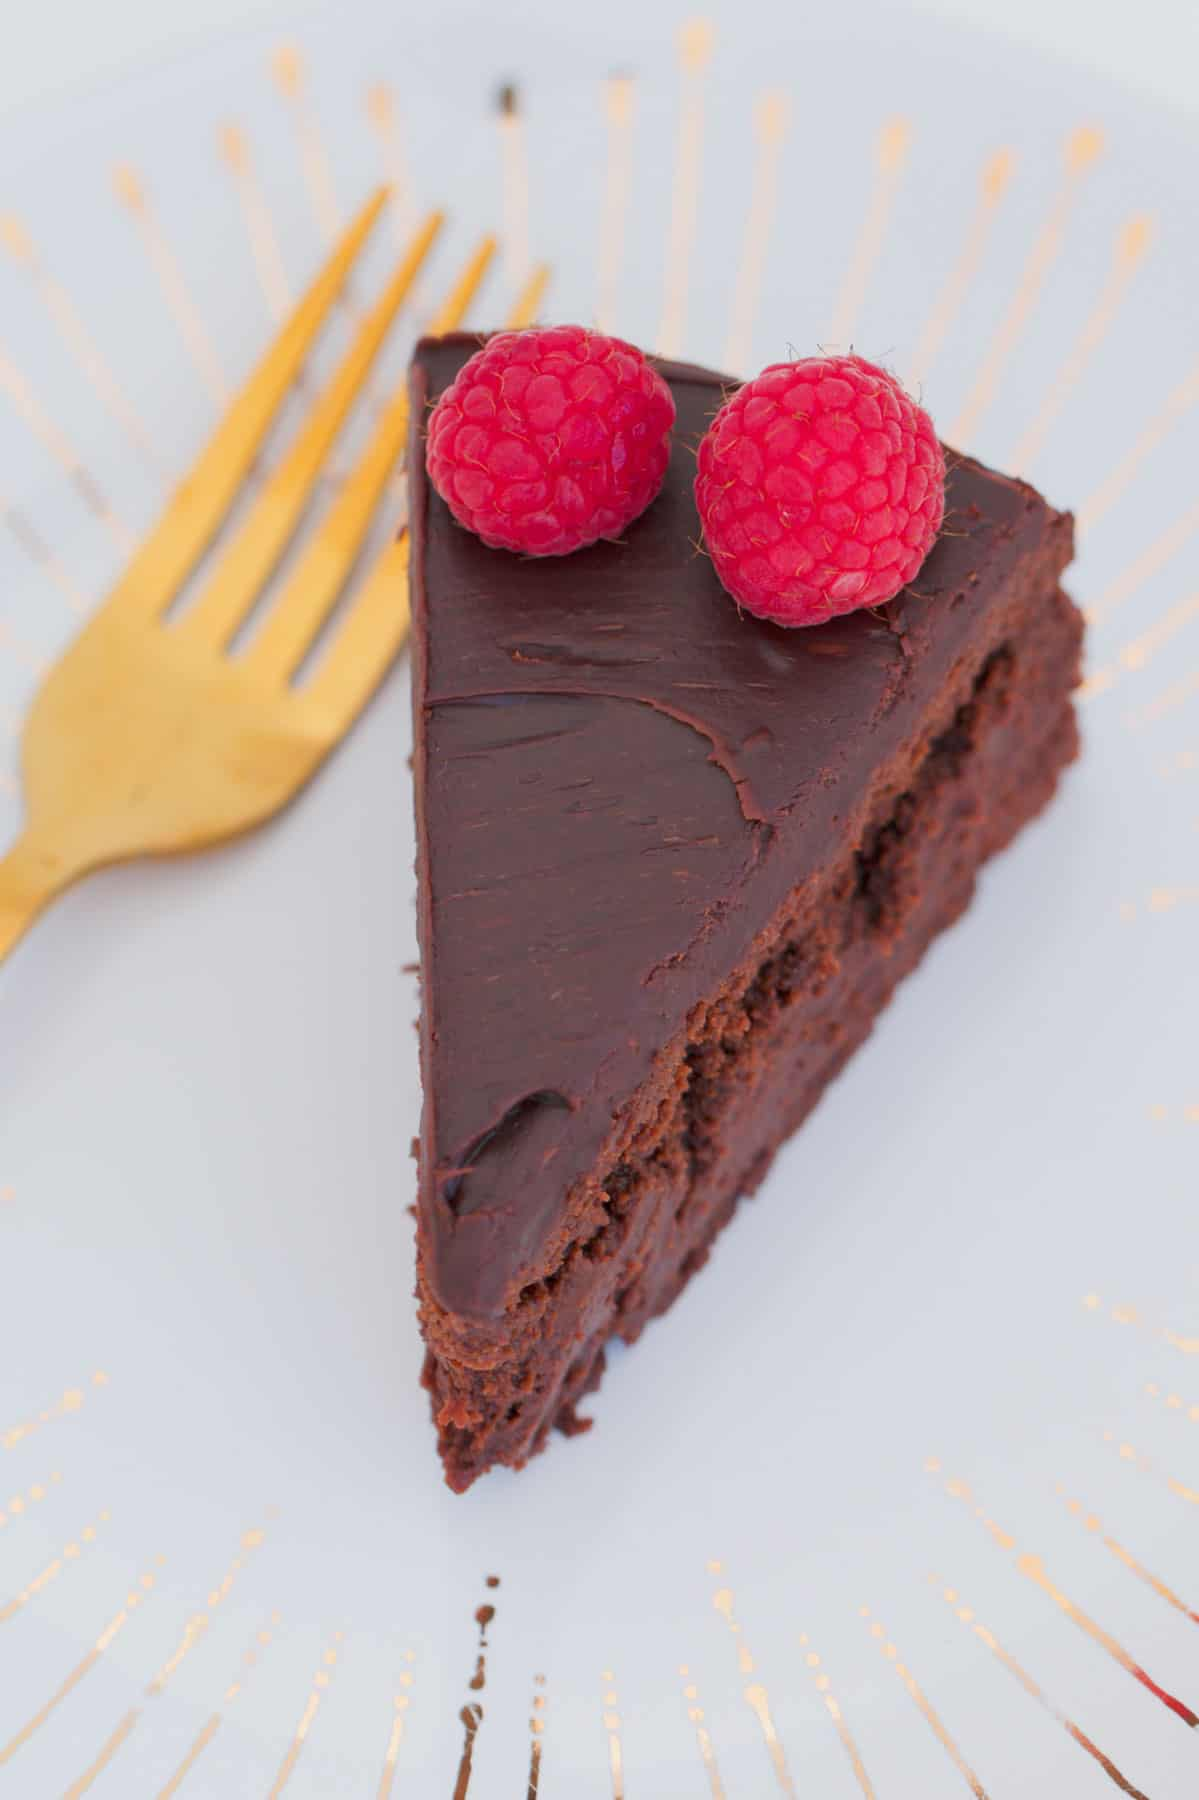 A piece of chocolate cake with ganache.